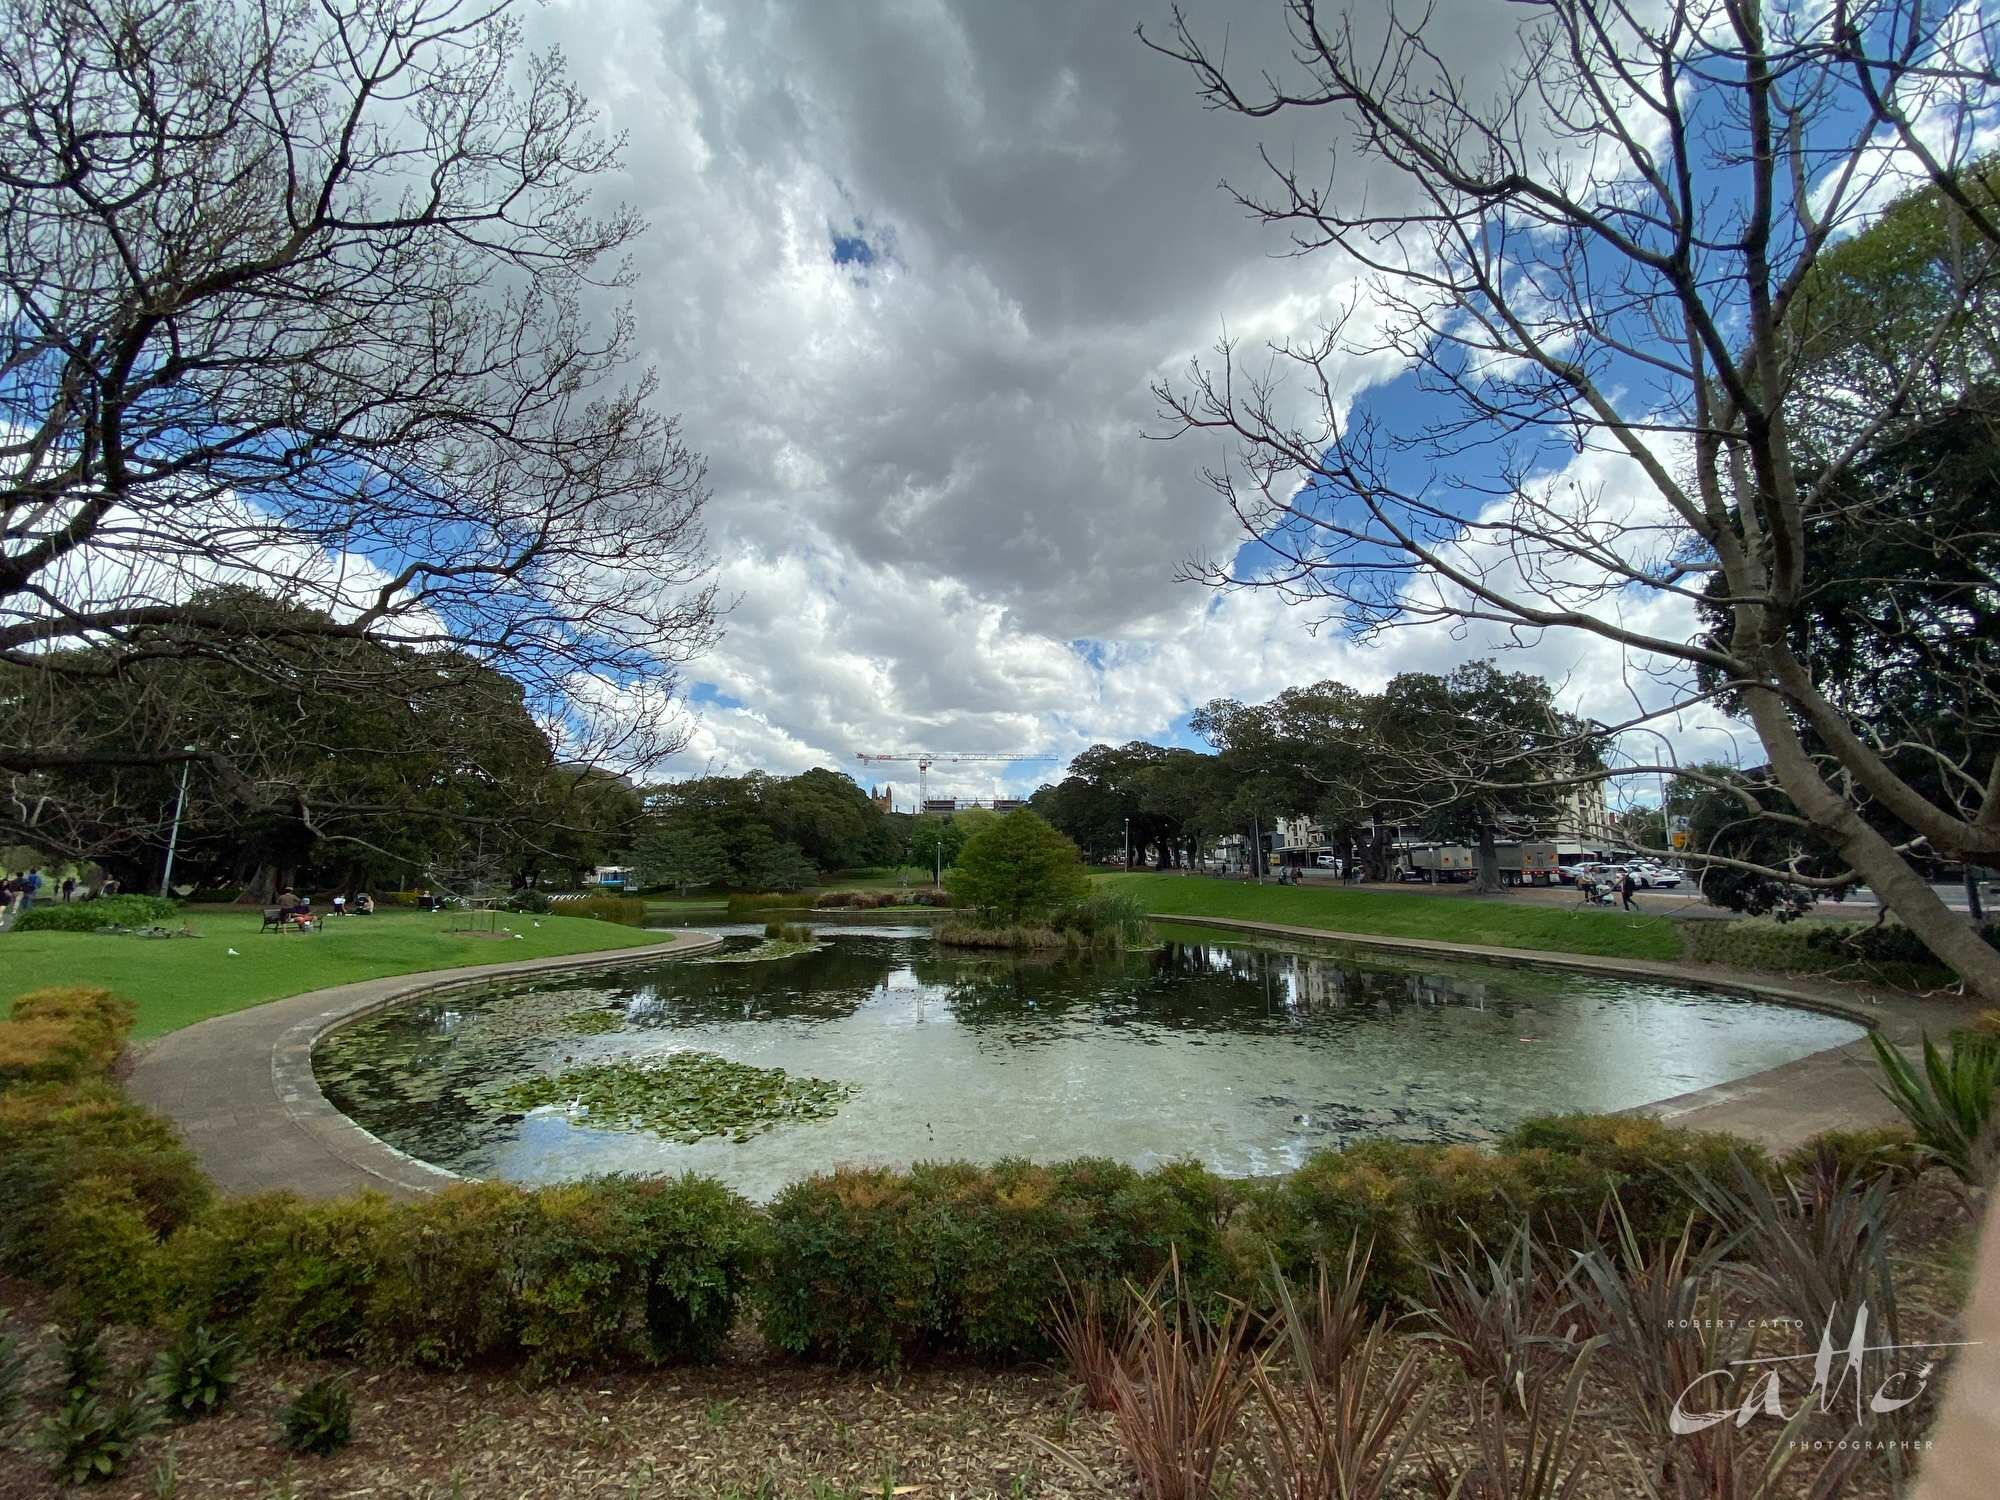 Lake Northam, Victoria Park, Sydney (iPhone 11 Pro - 0.5x wide lens)